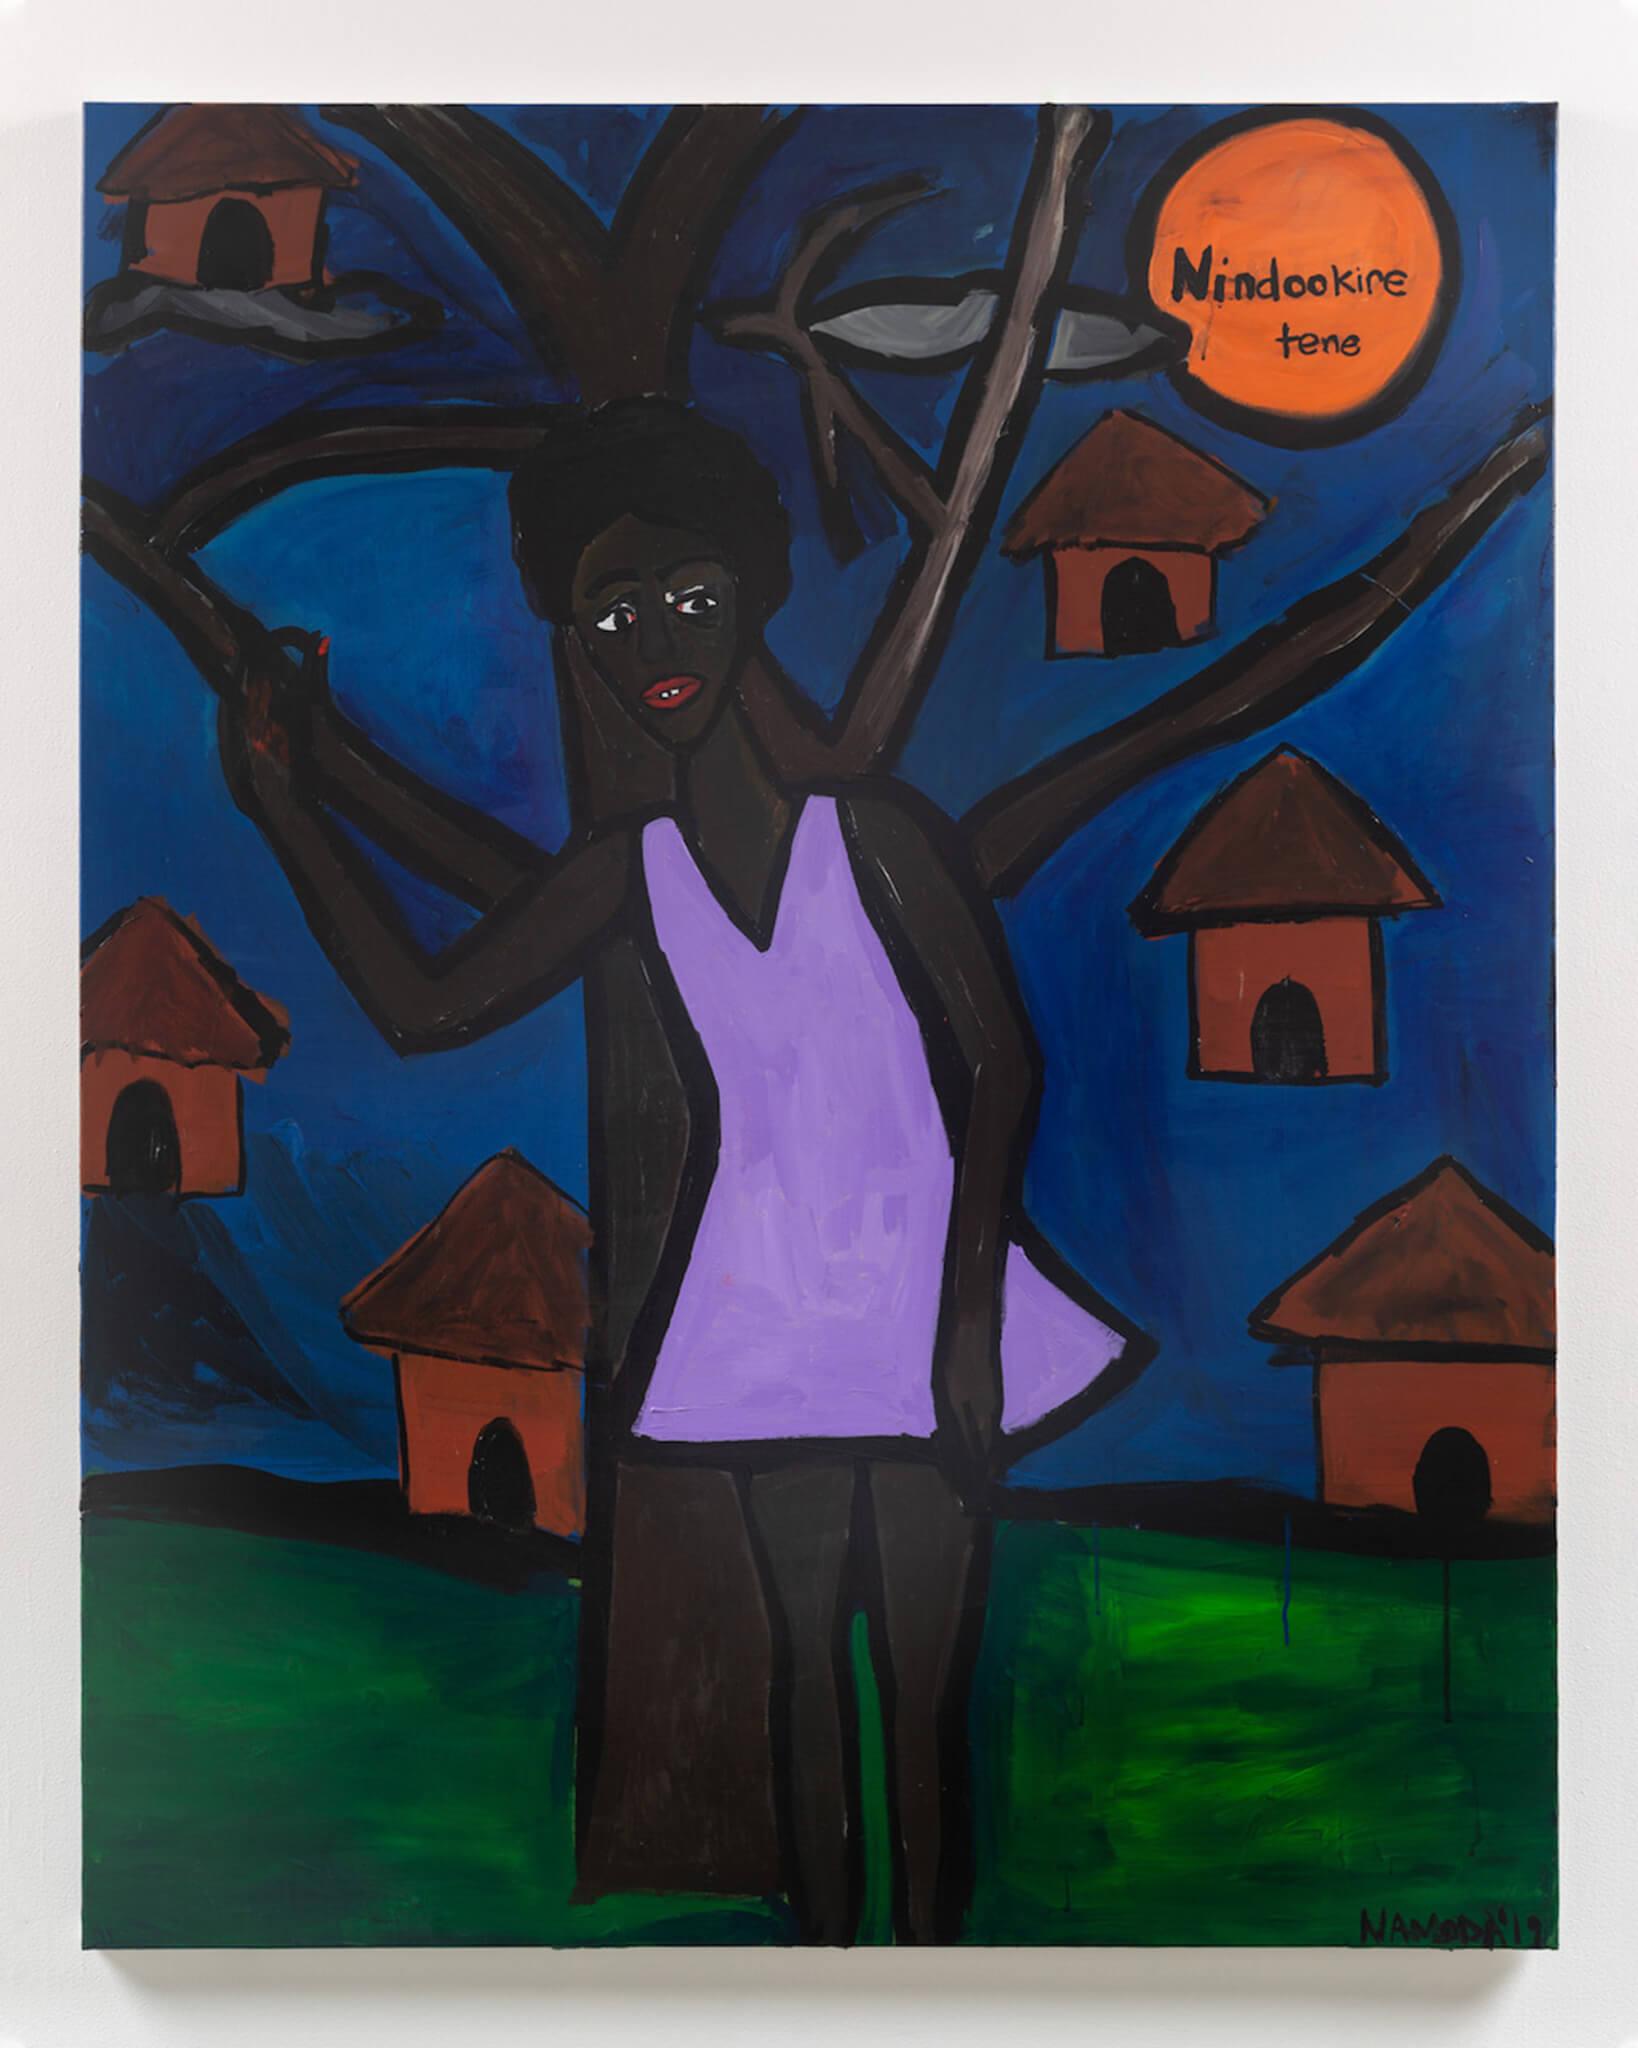 Namoda, Spirit Of a Man Who Died a Long Time Ago, 2019 (CN 19.031) copy